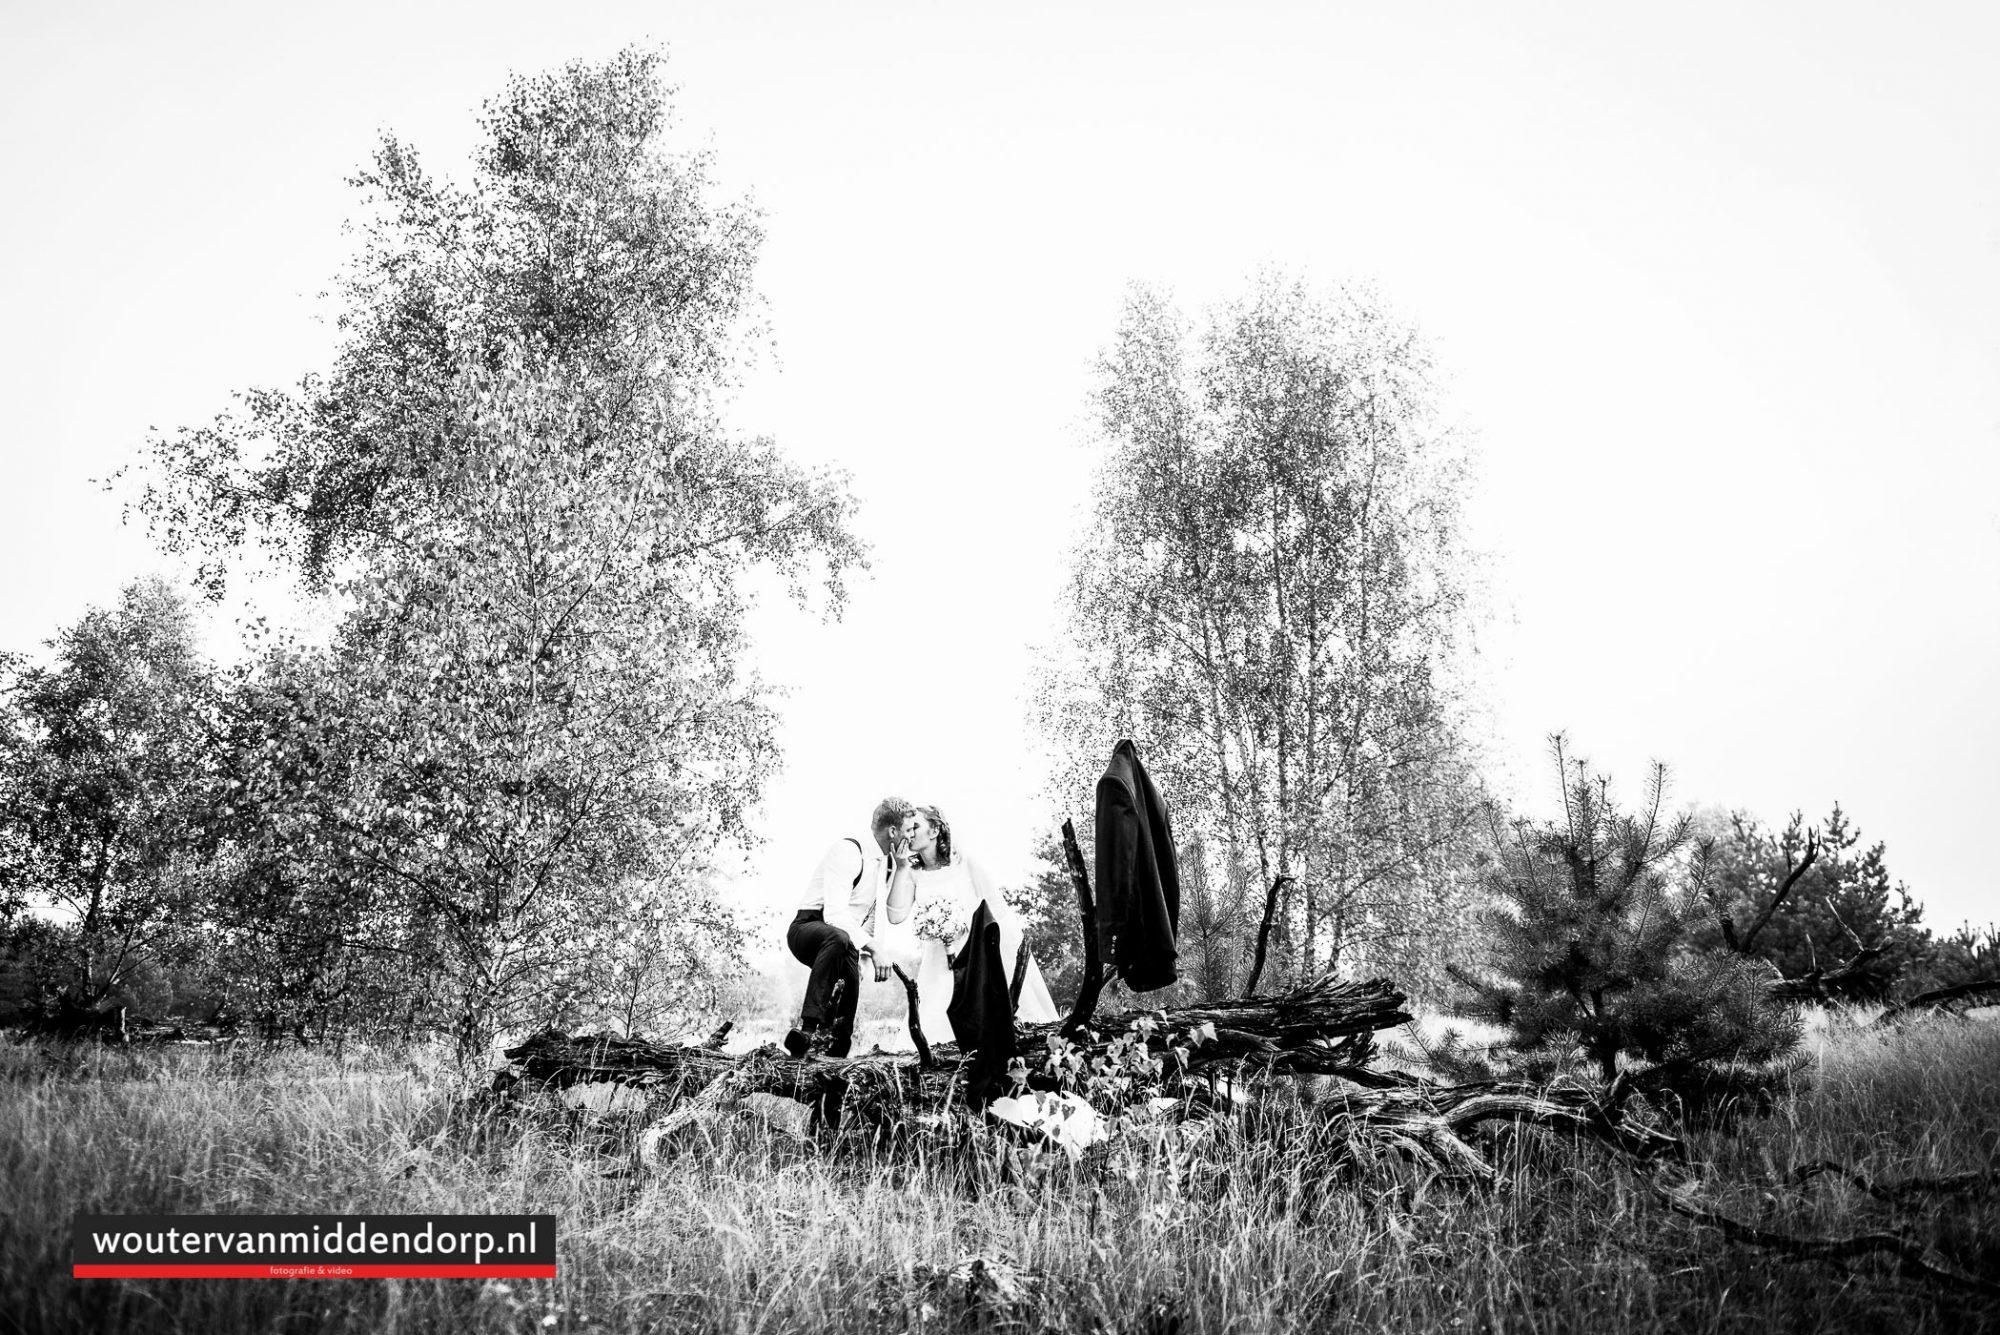 trouwfotograaf-wouter-van-middendorp-omgeving-veluwe-barneveld-uddel-40-van-58